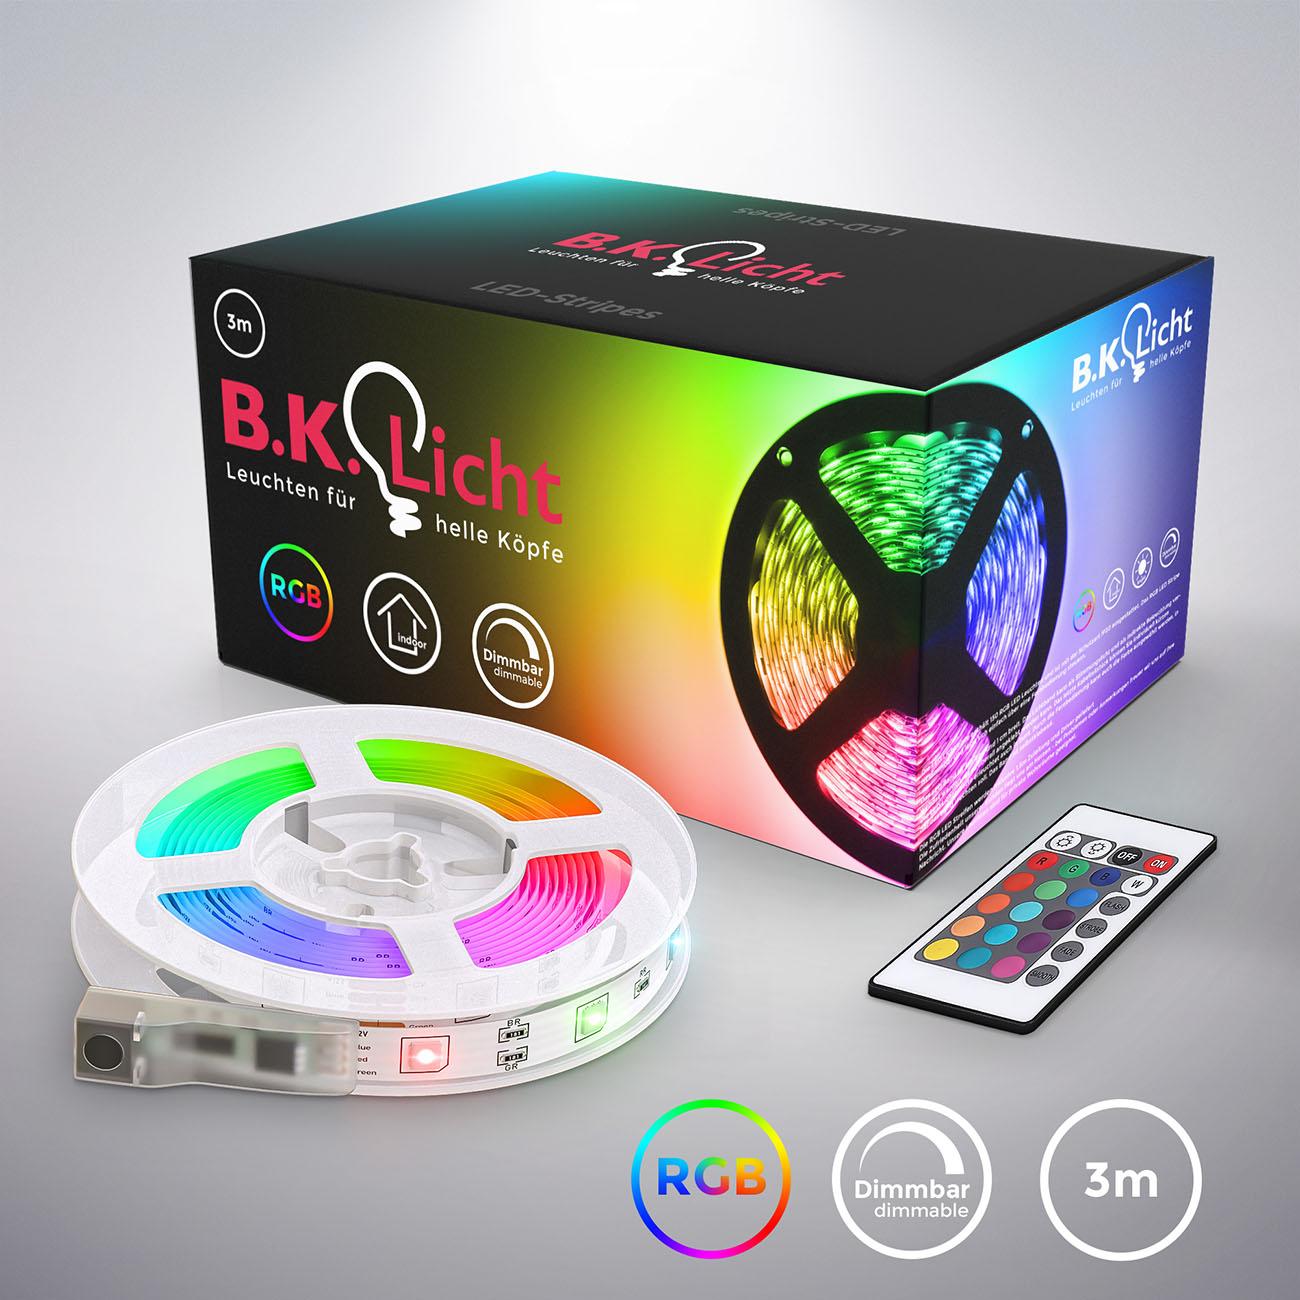 RGB LED Streifen mit Farbwechsel 3m - 3